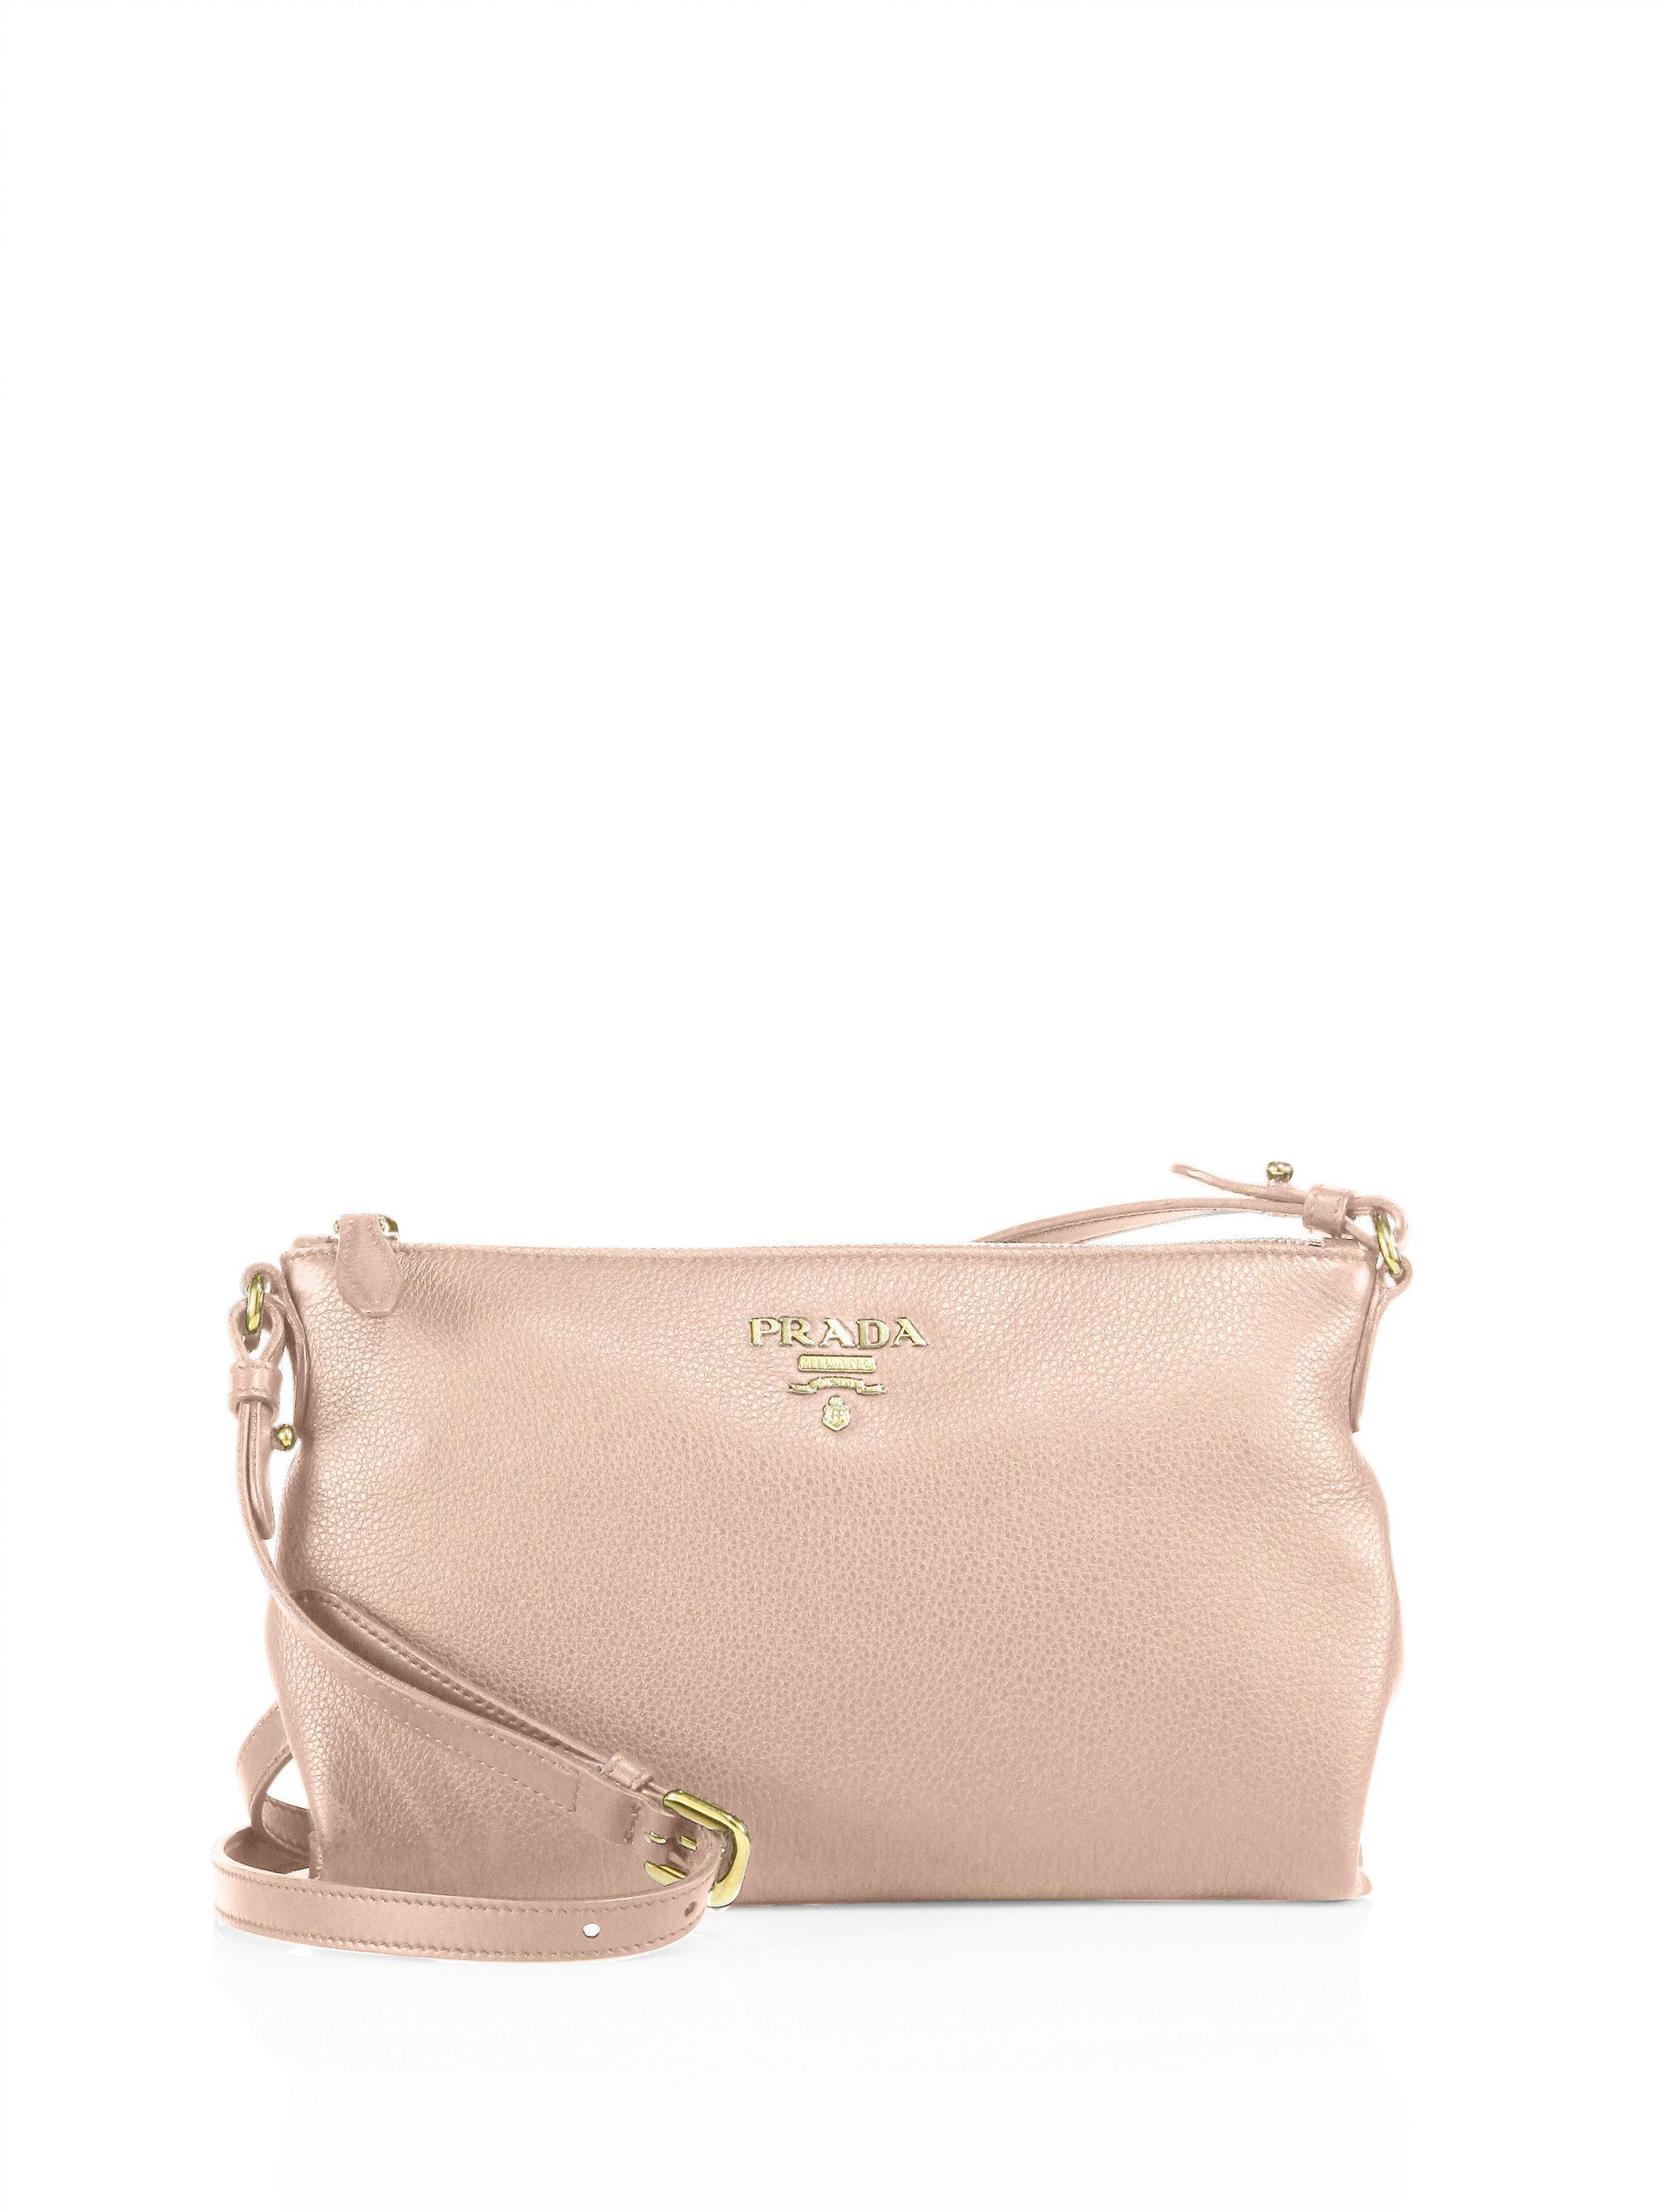 ed4132445a83 ... cheap lyst prada vit daino leather crossbody bag in pink 6e3cb c167f